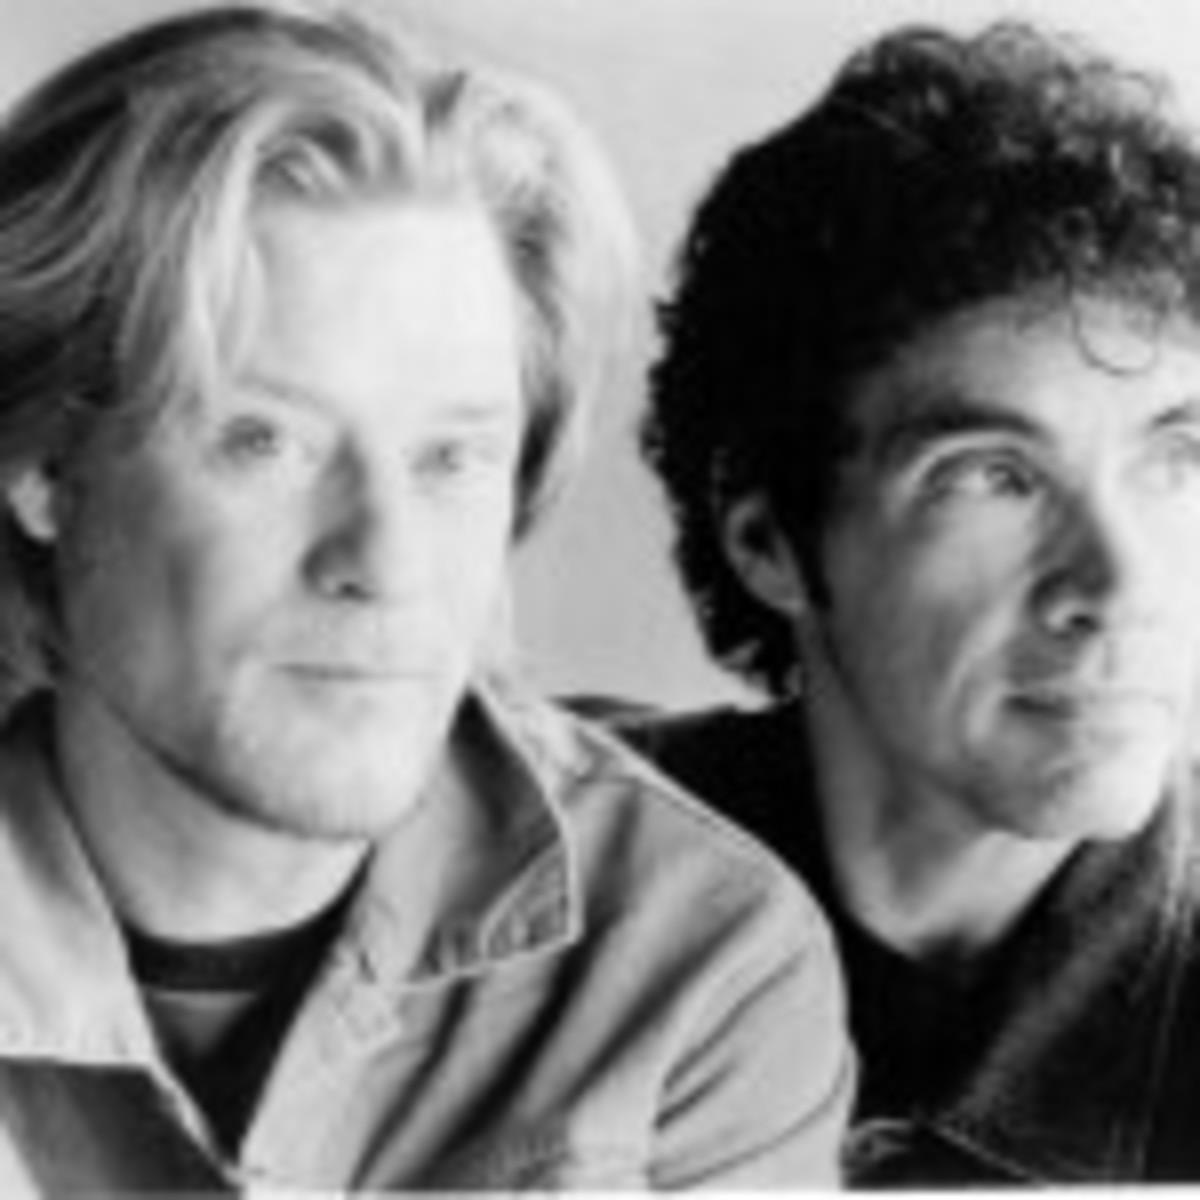 Daryl Hall (left) and John Oates